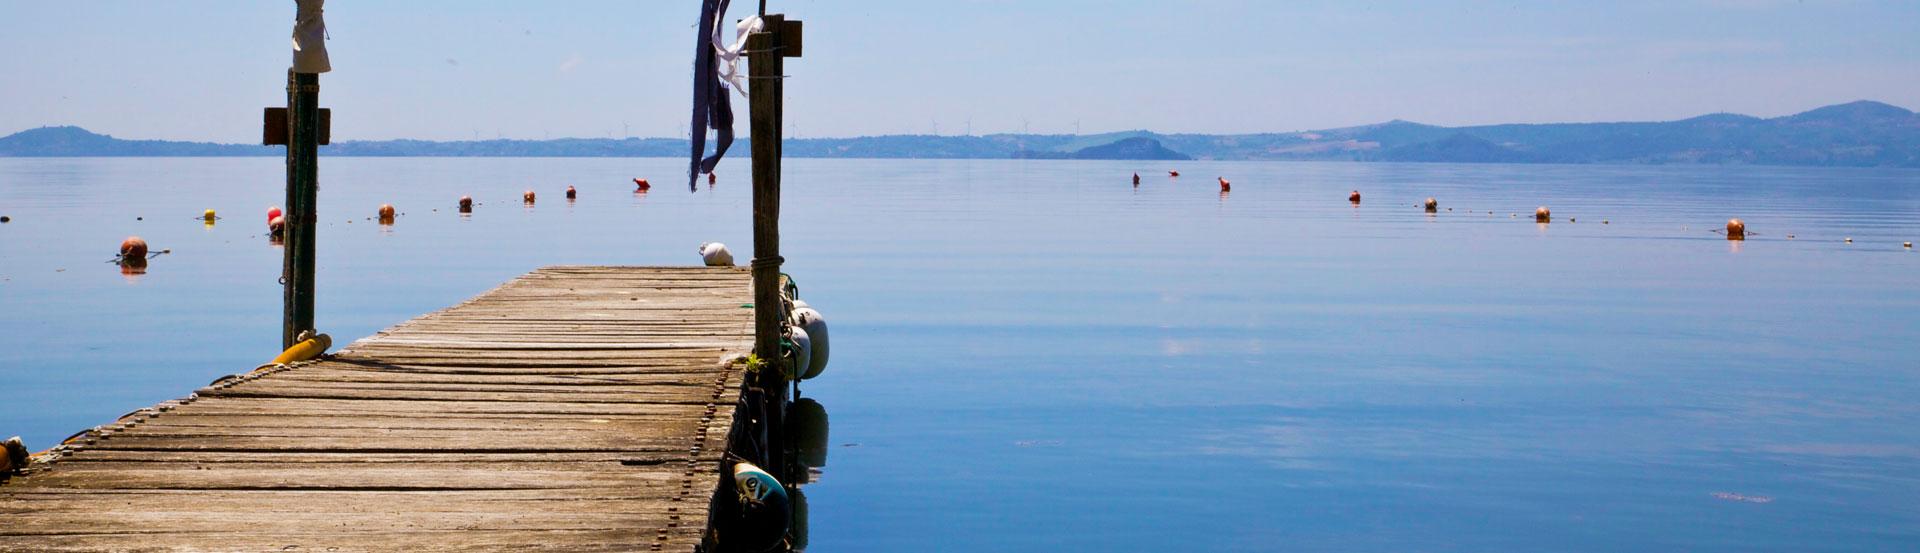 camping-valdisole-bolsena-lake-1920-553-04